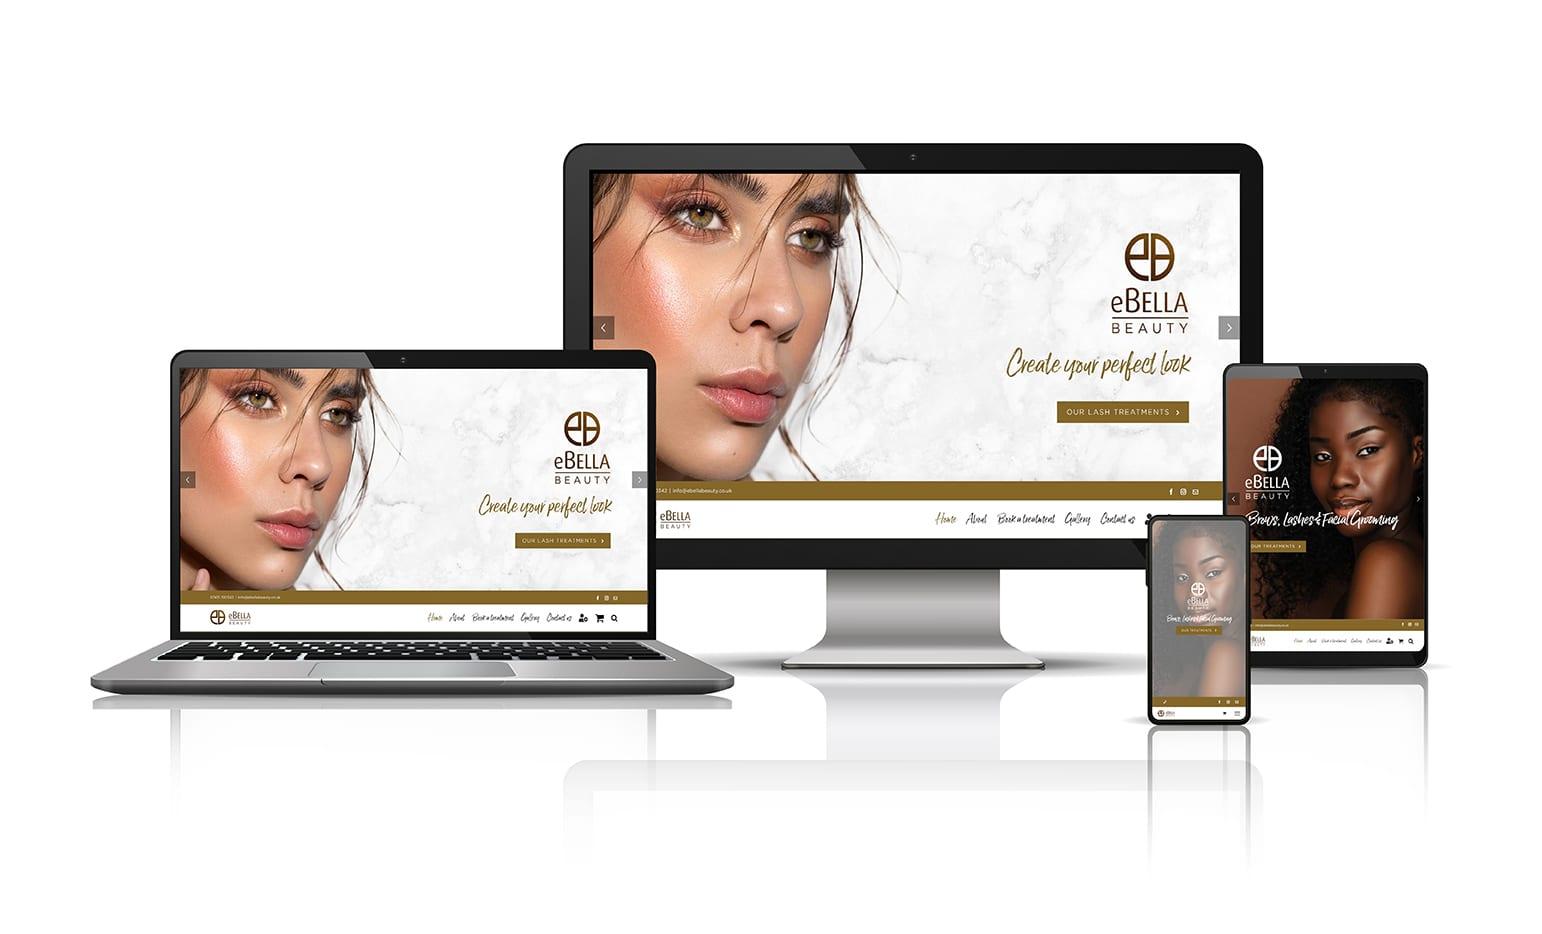 eBella Beauty's website